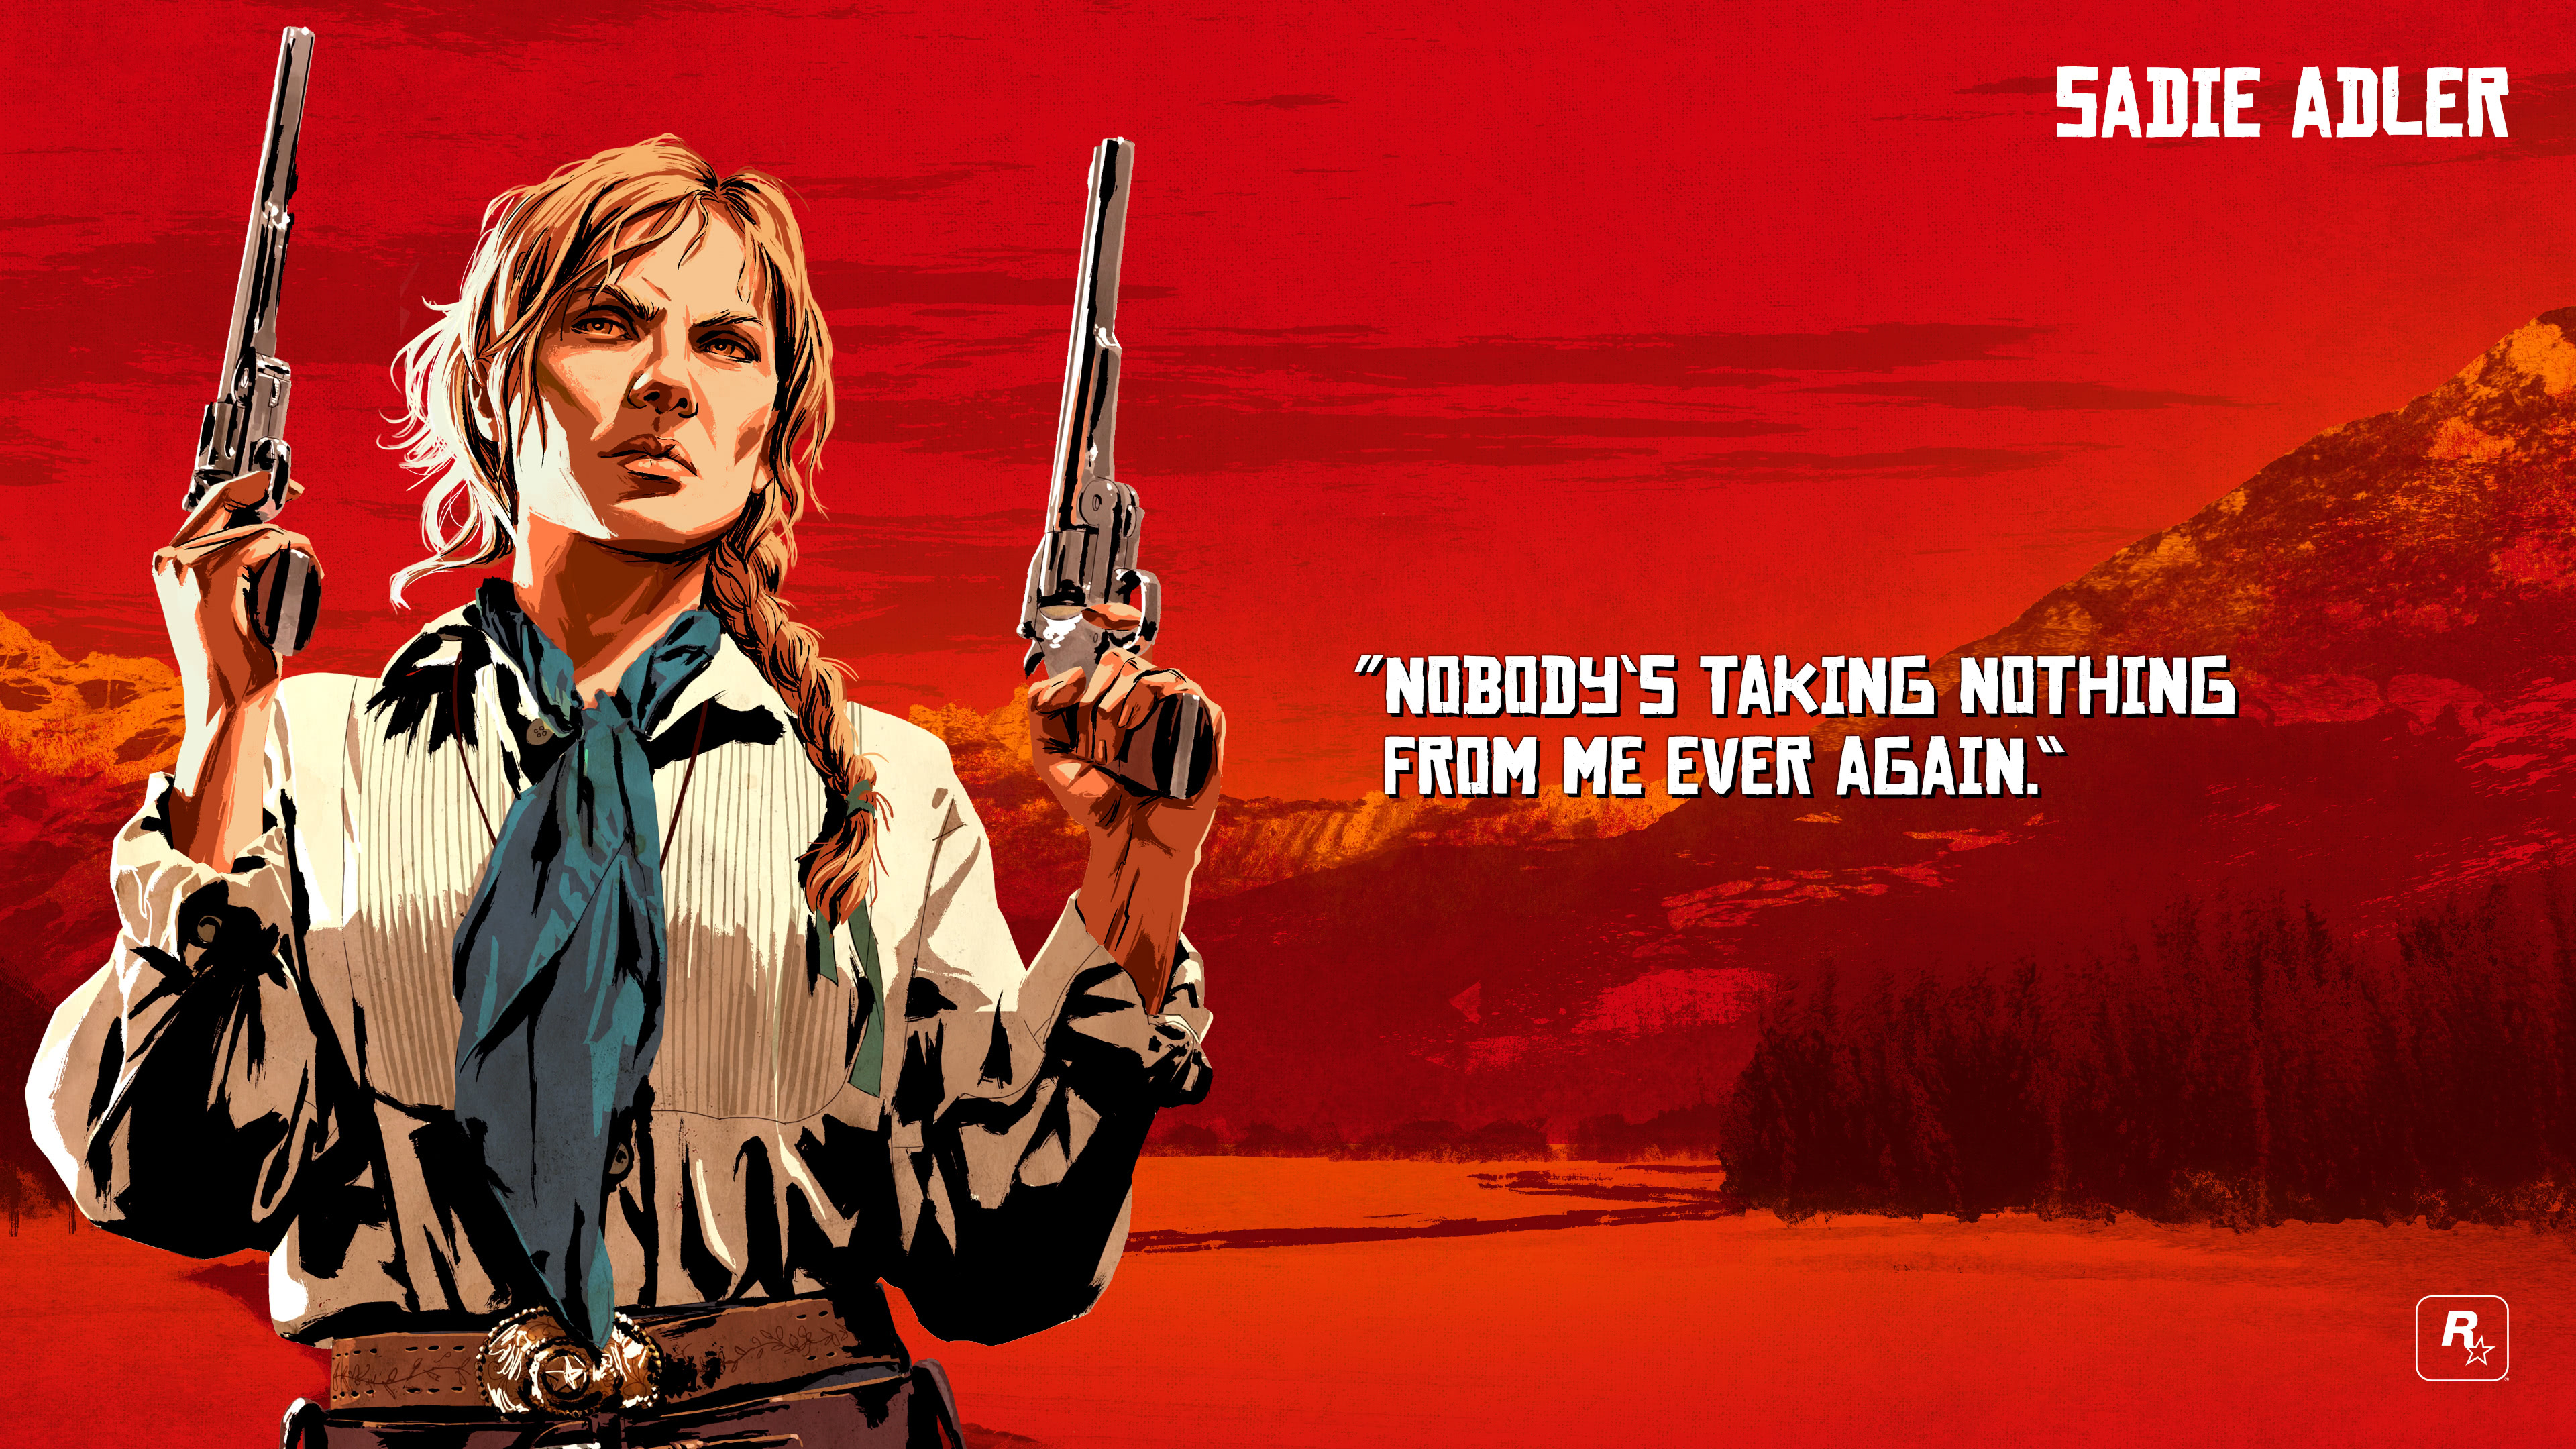 Red Dead Redemption 2 Sadie Adler Uhd 4k Wallpaper Pixelz